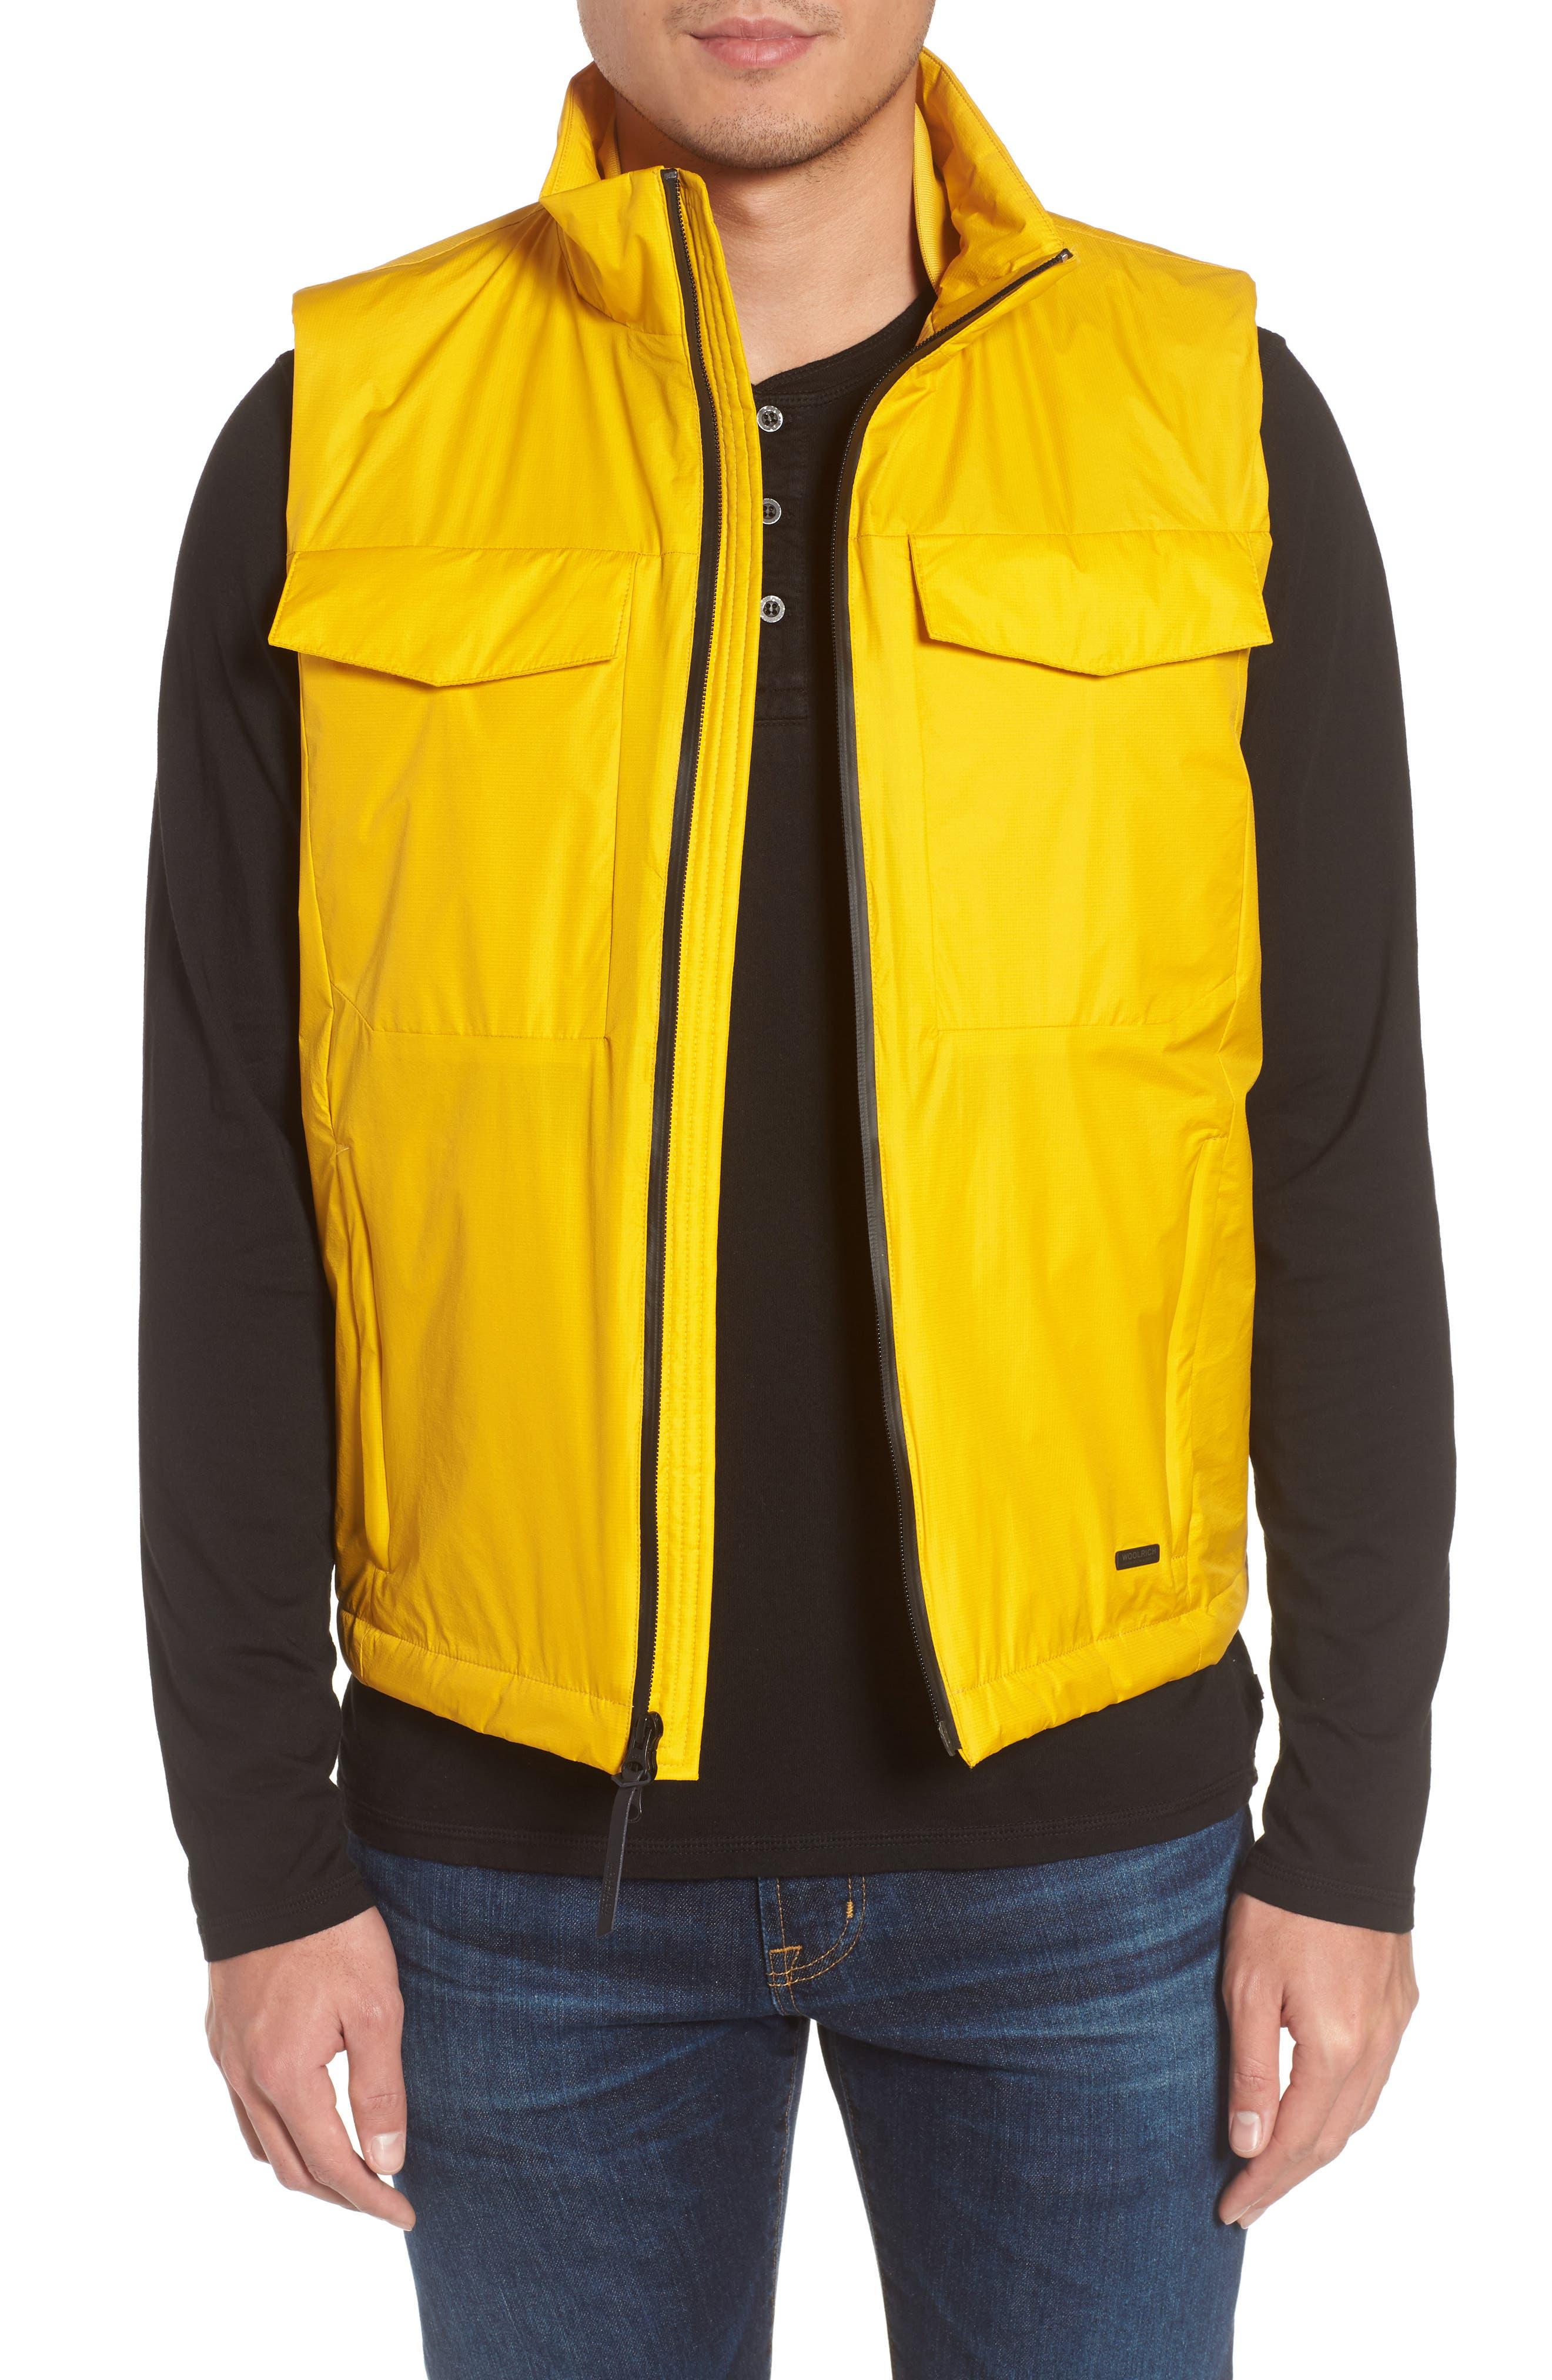 & Bros. Bering Vest,                             Main thumbnail 1, color,                             Golden Spice